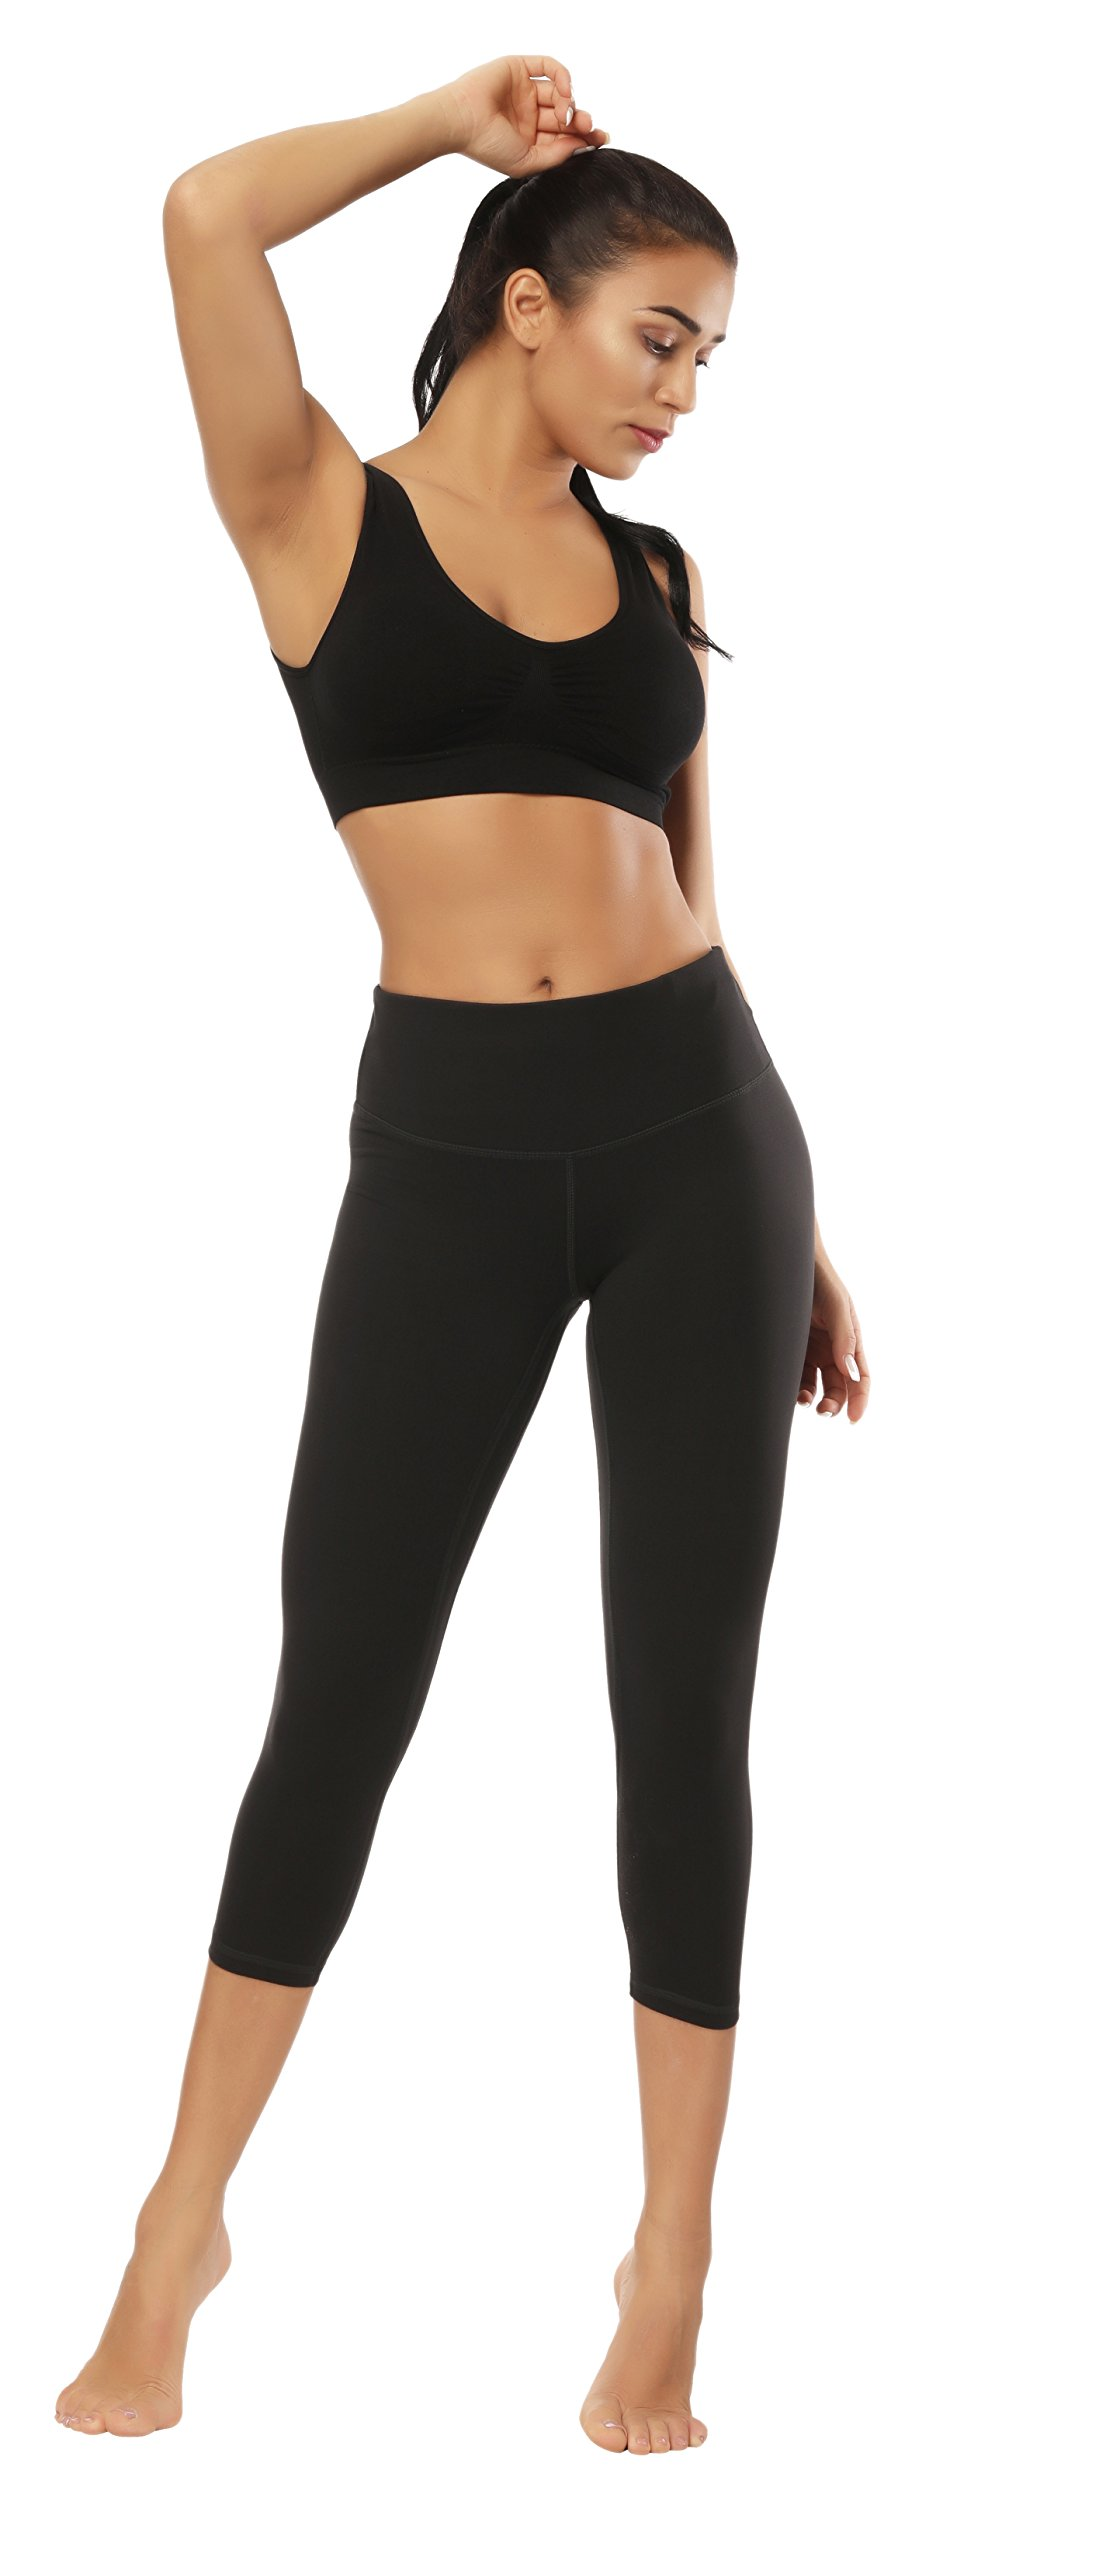 Fengbay Capris Leggings, Capris Yoga Pants Tummy Control Workout Running 4 Way Stretch High Waist Capris Workout Leggings by Fengbay (Image #6)